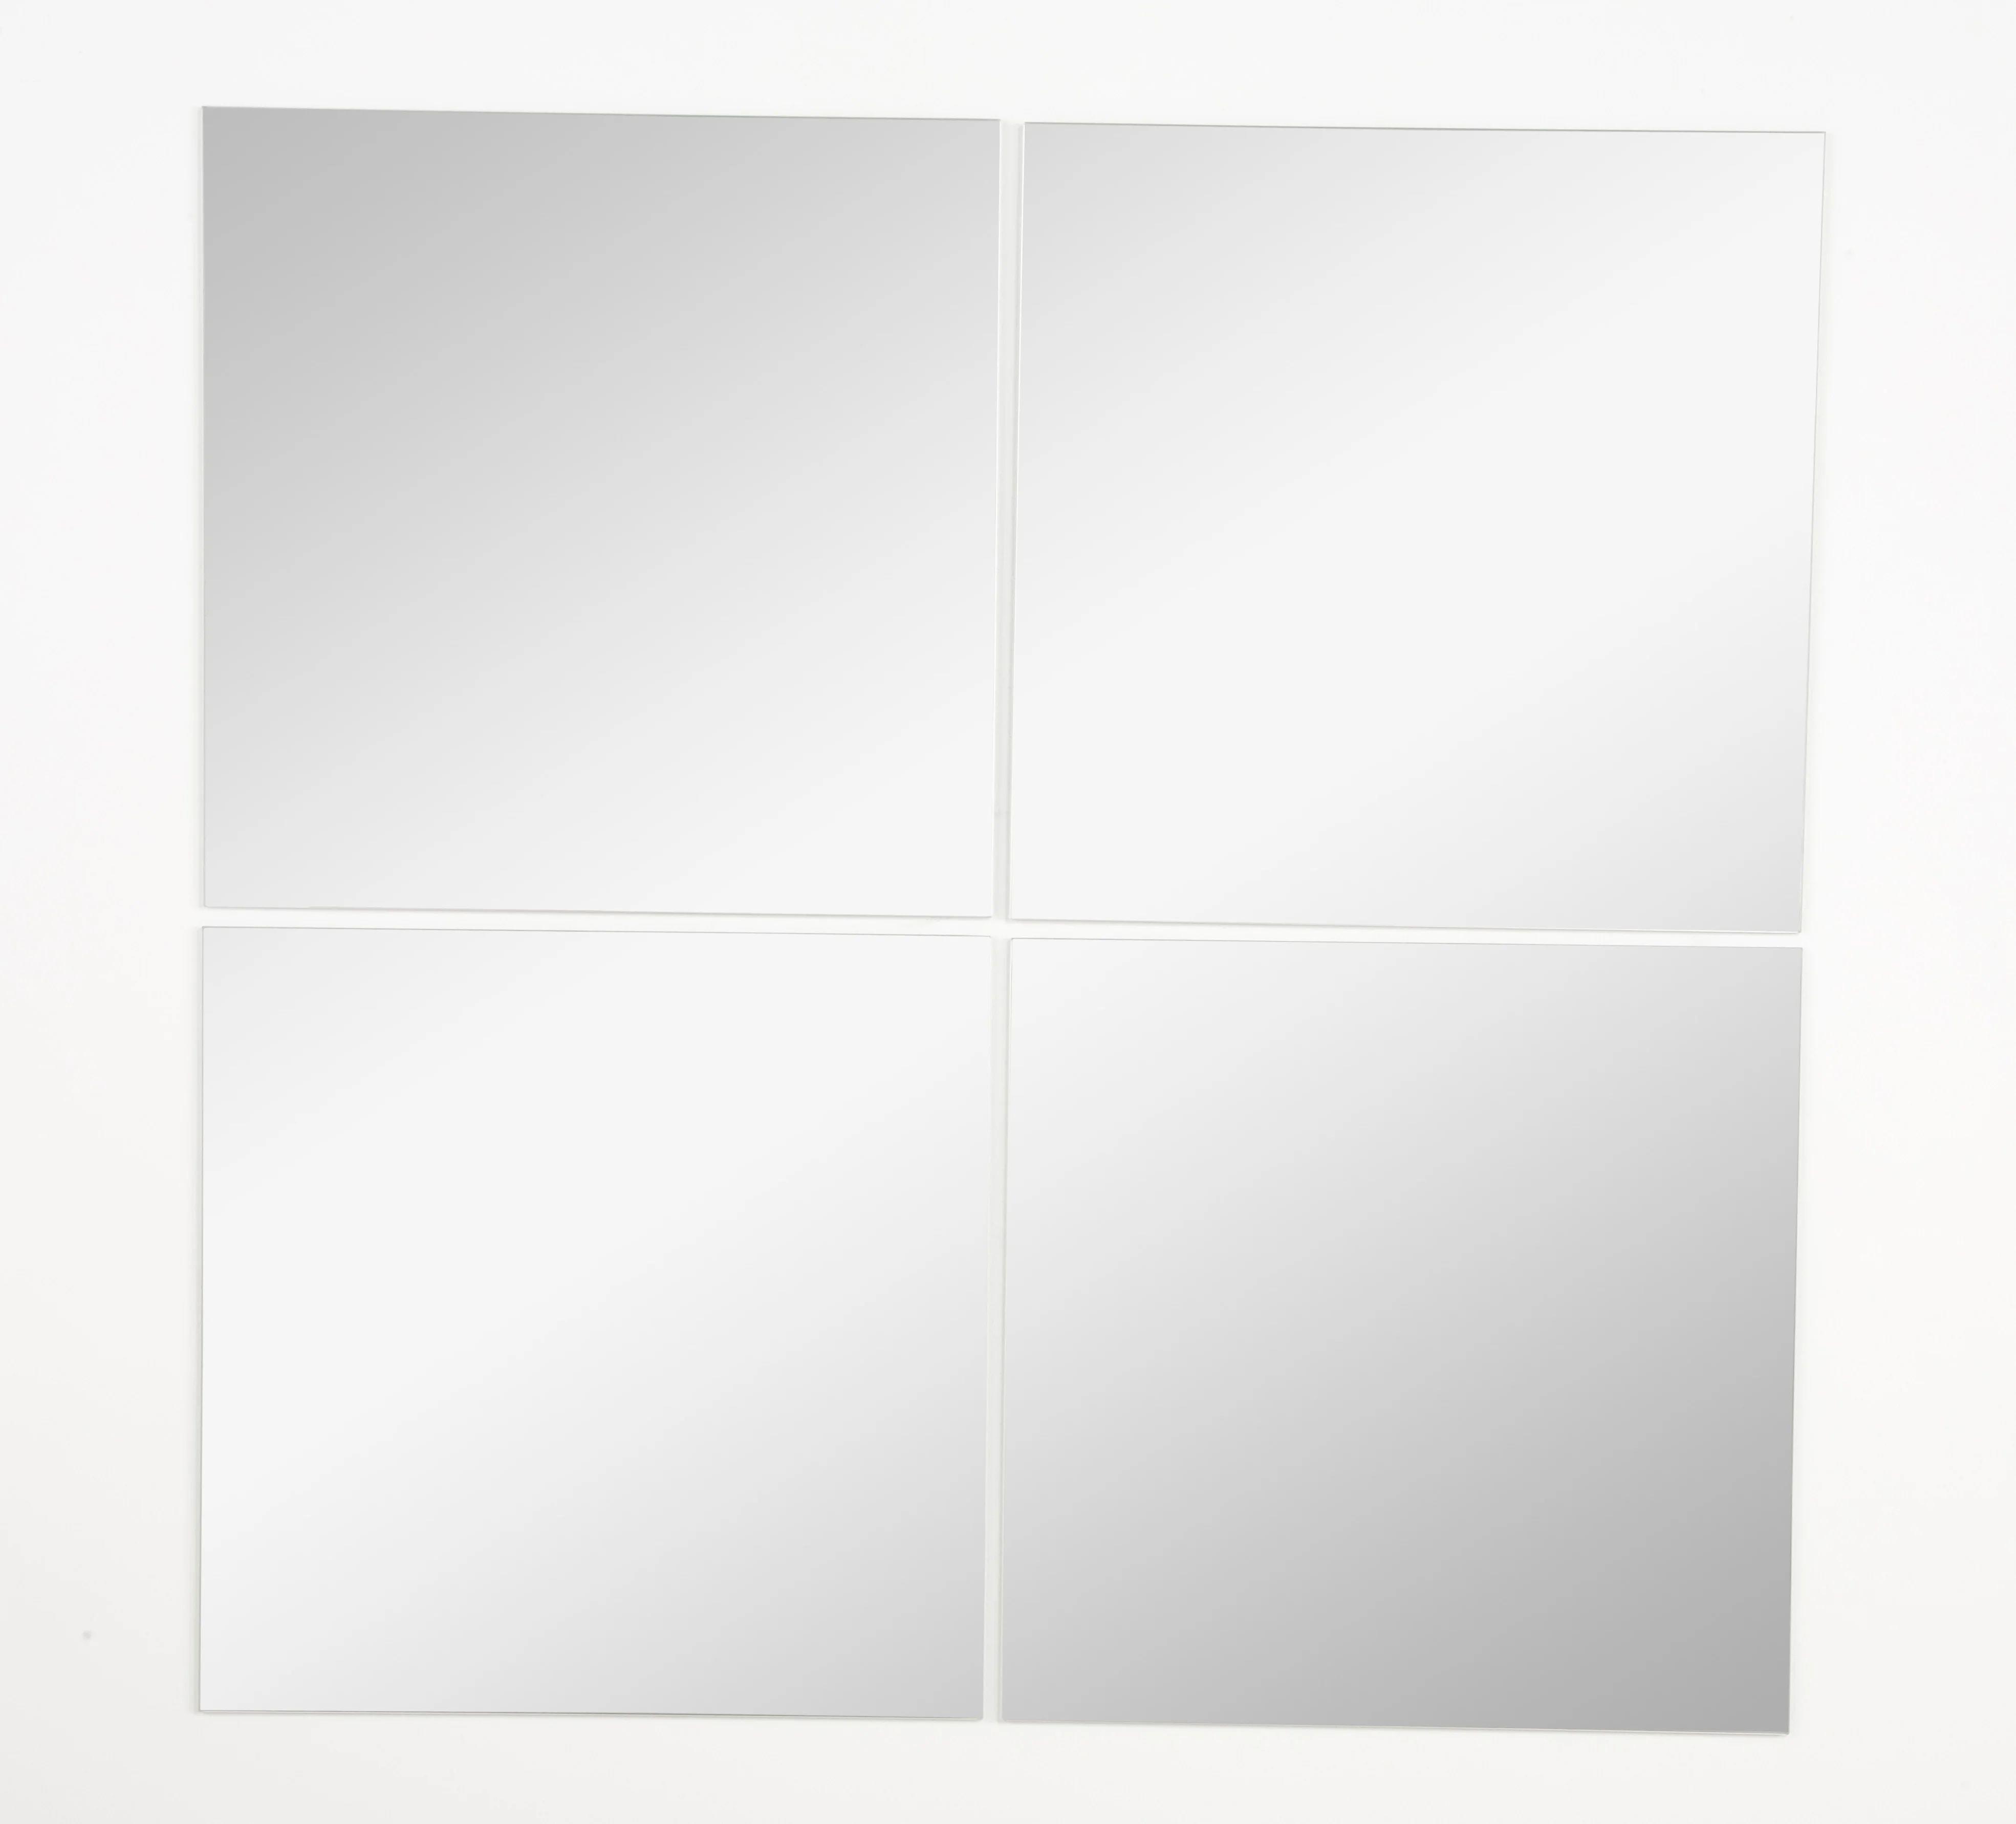 Lot De 4 Miroirs Non Lumineux Adhesifs Carres L 30 X L 30 Cm Leroy Merlin